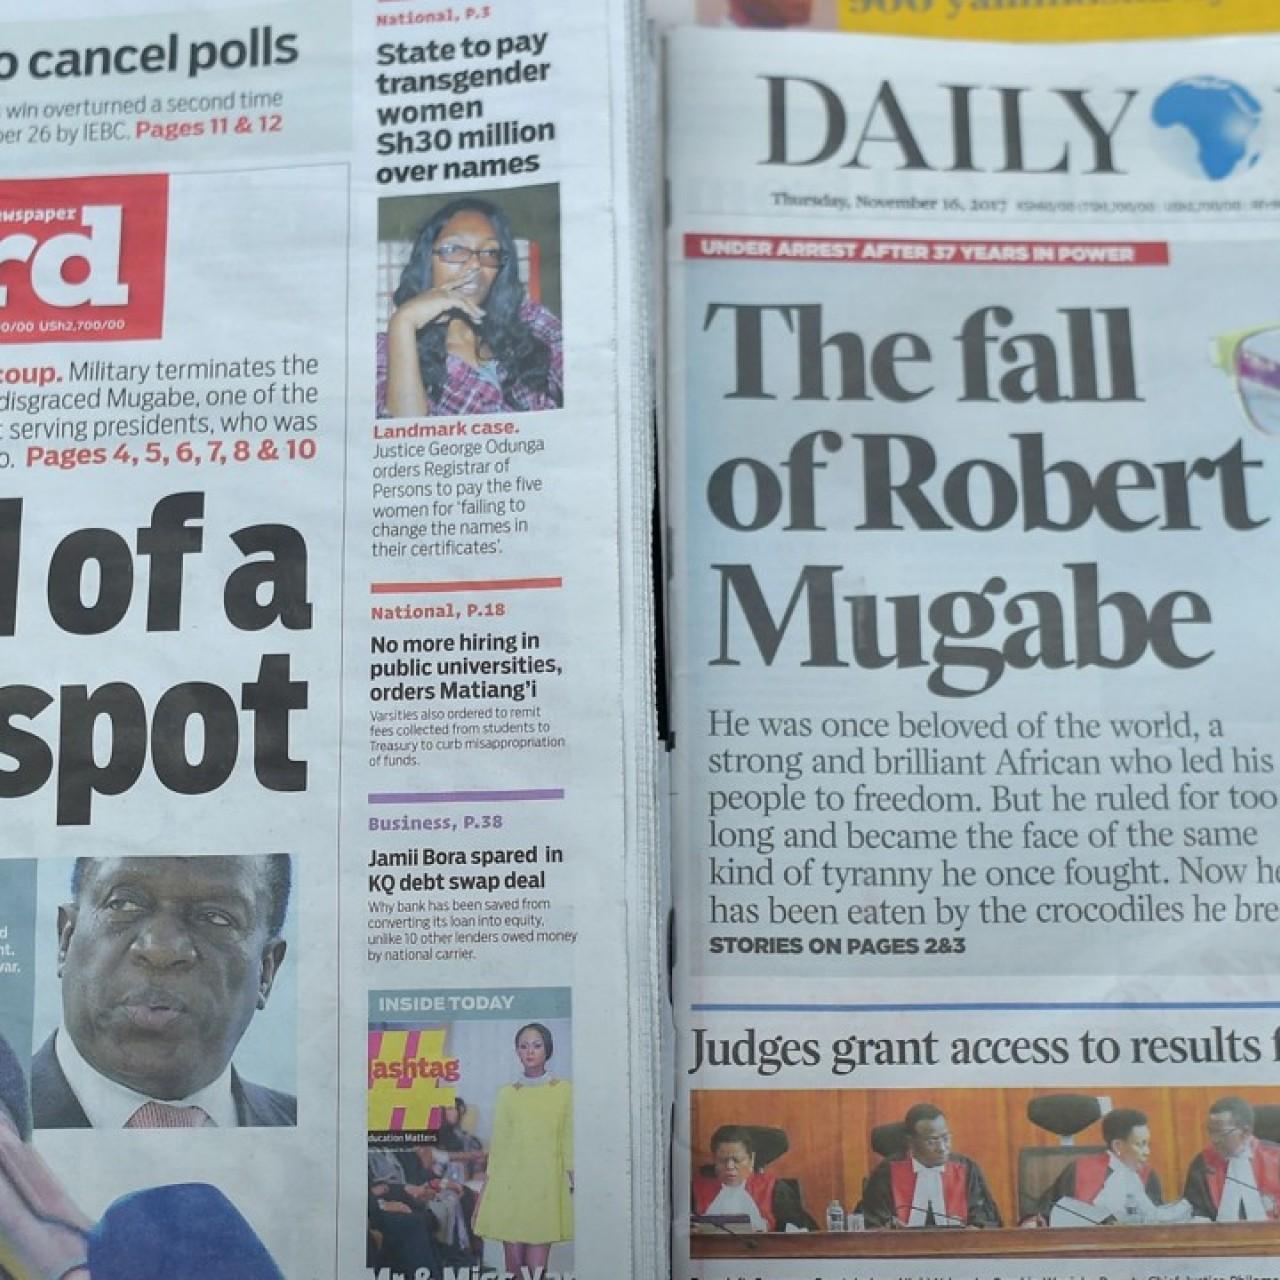 Zimbabweans face uncertain future beyond Robert Mugabe as